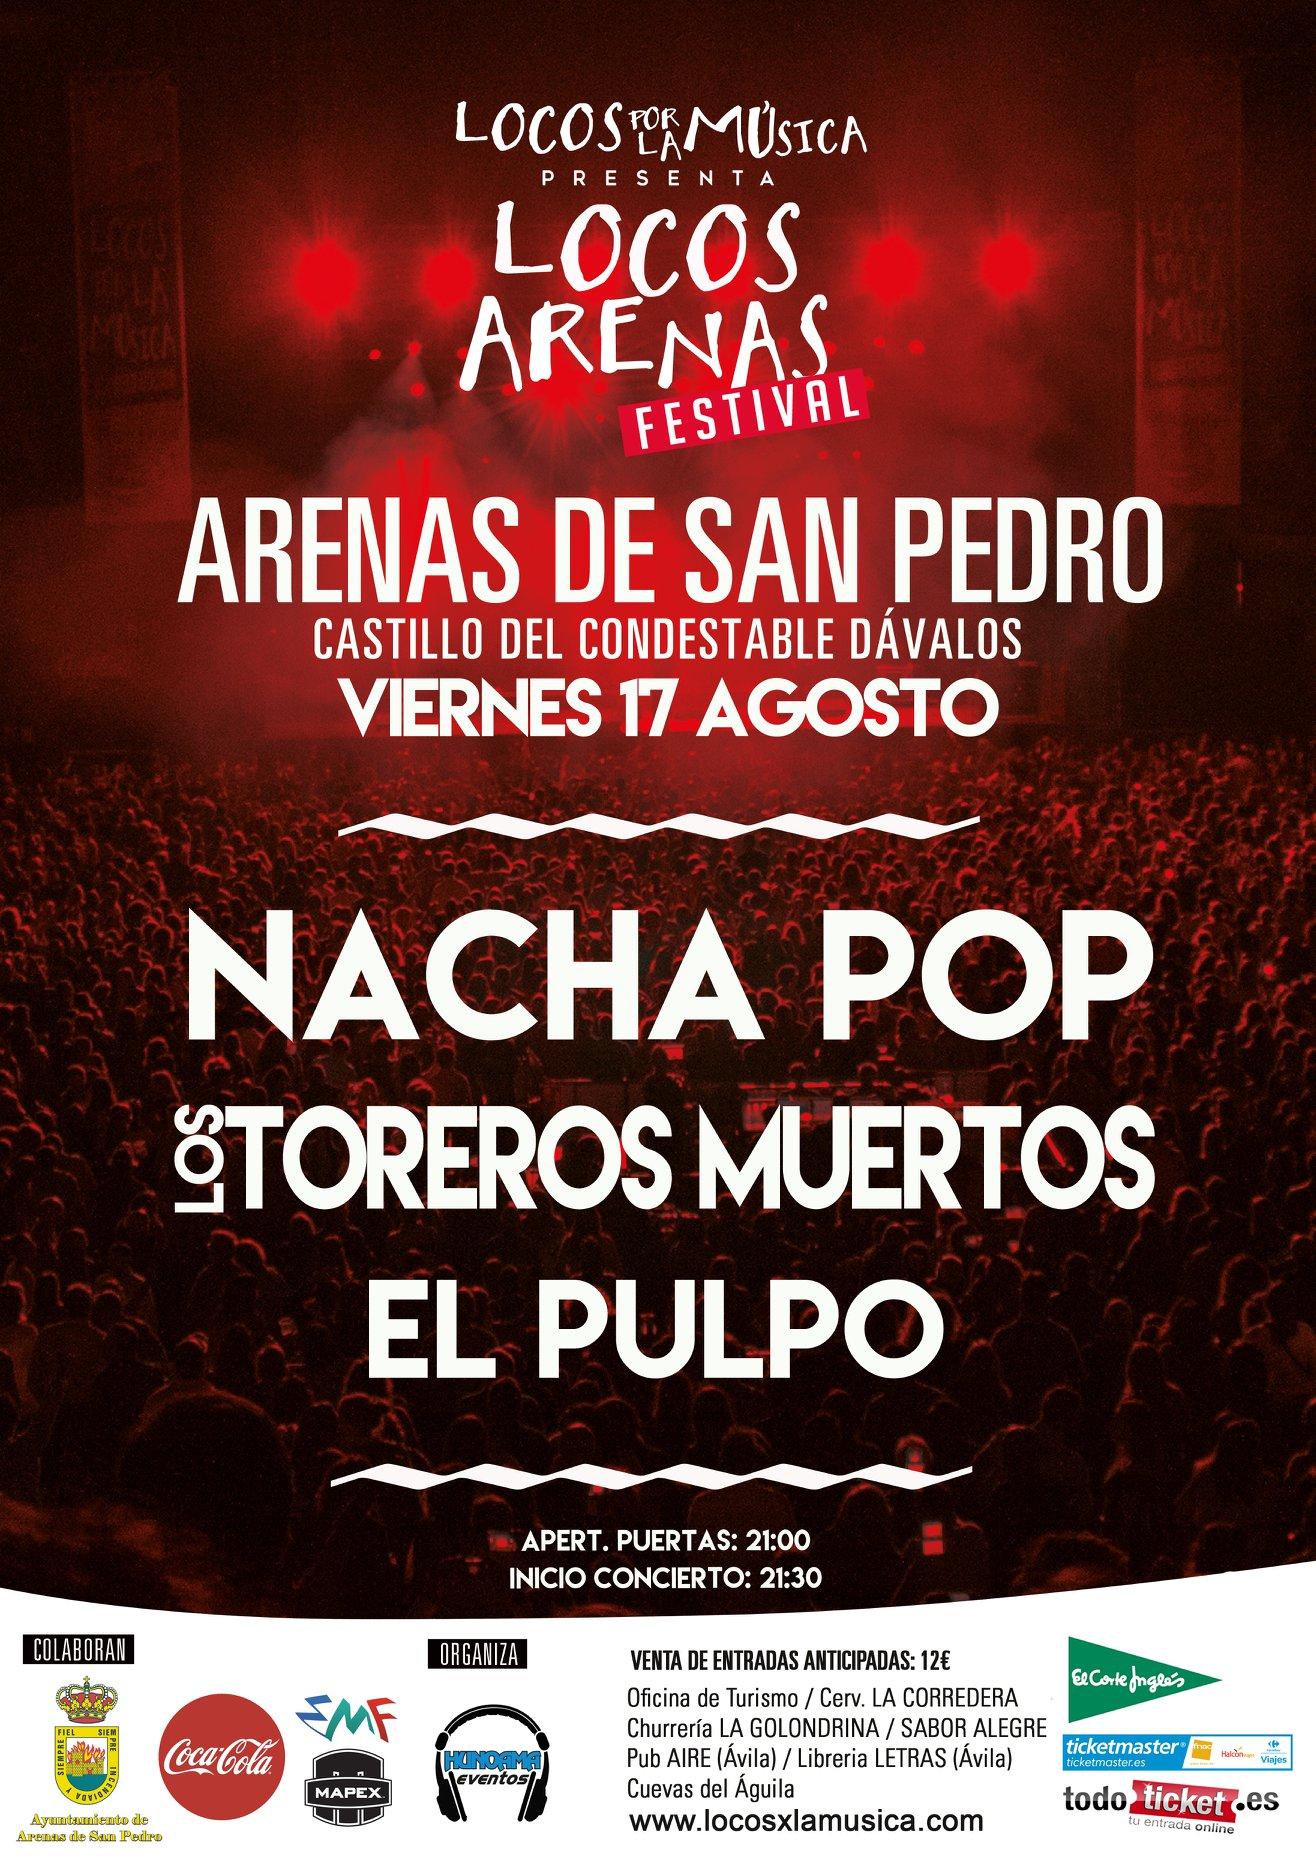 Locos x Arenas - Arenas de San Pedro - TiétarTeVe